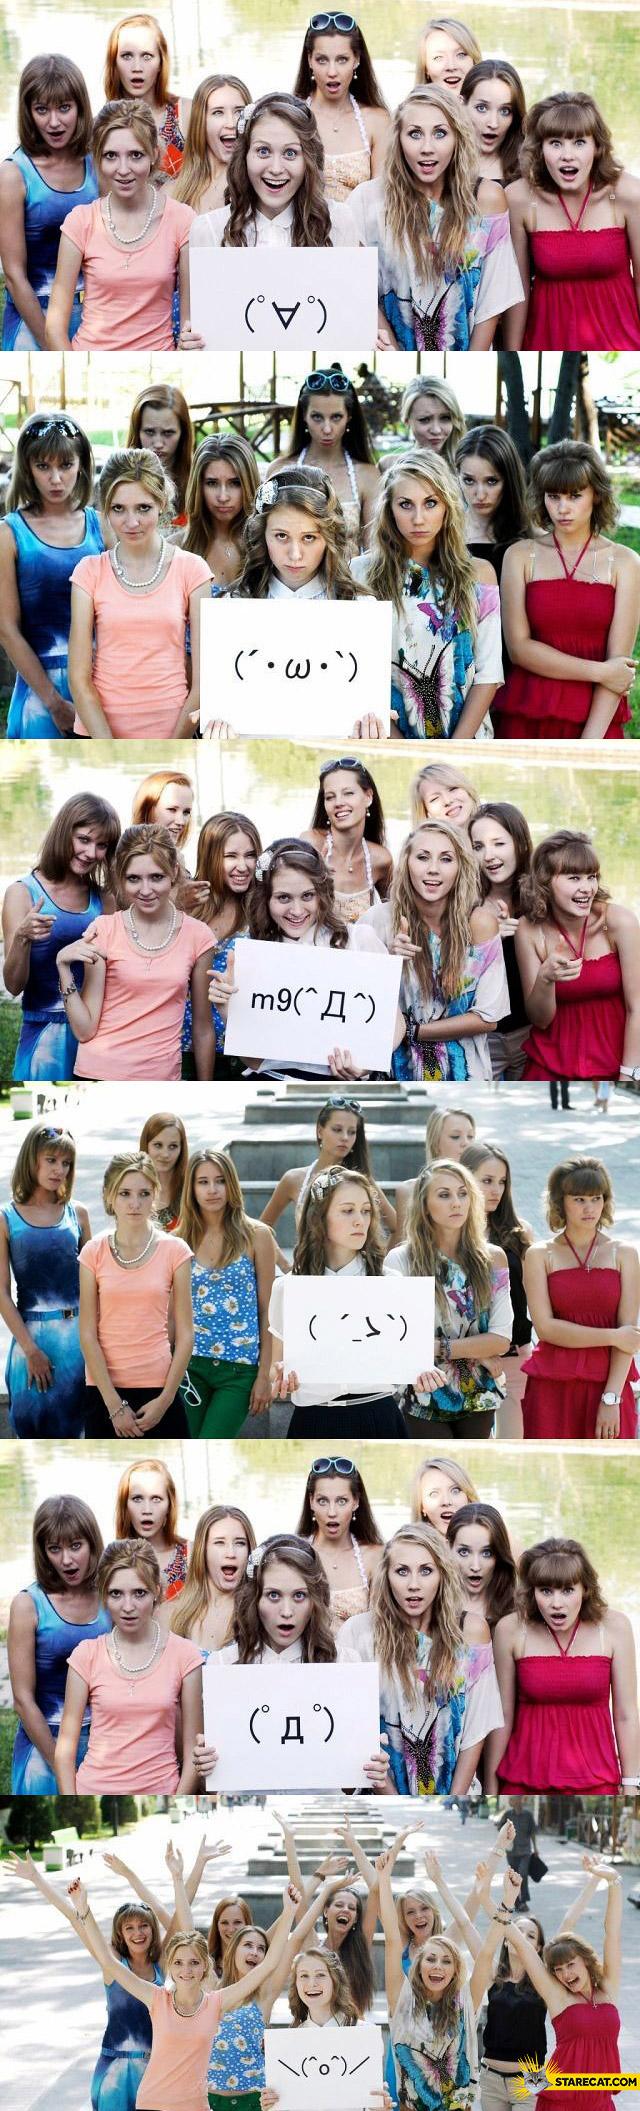 Emoticons live girls